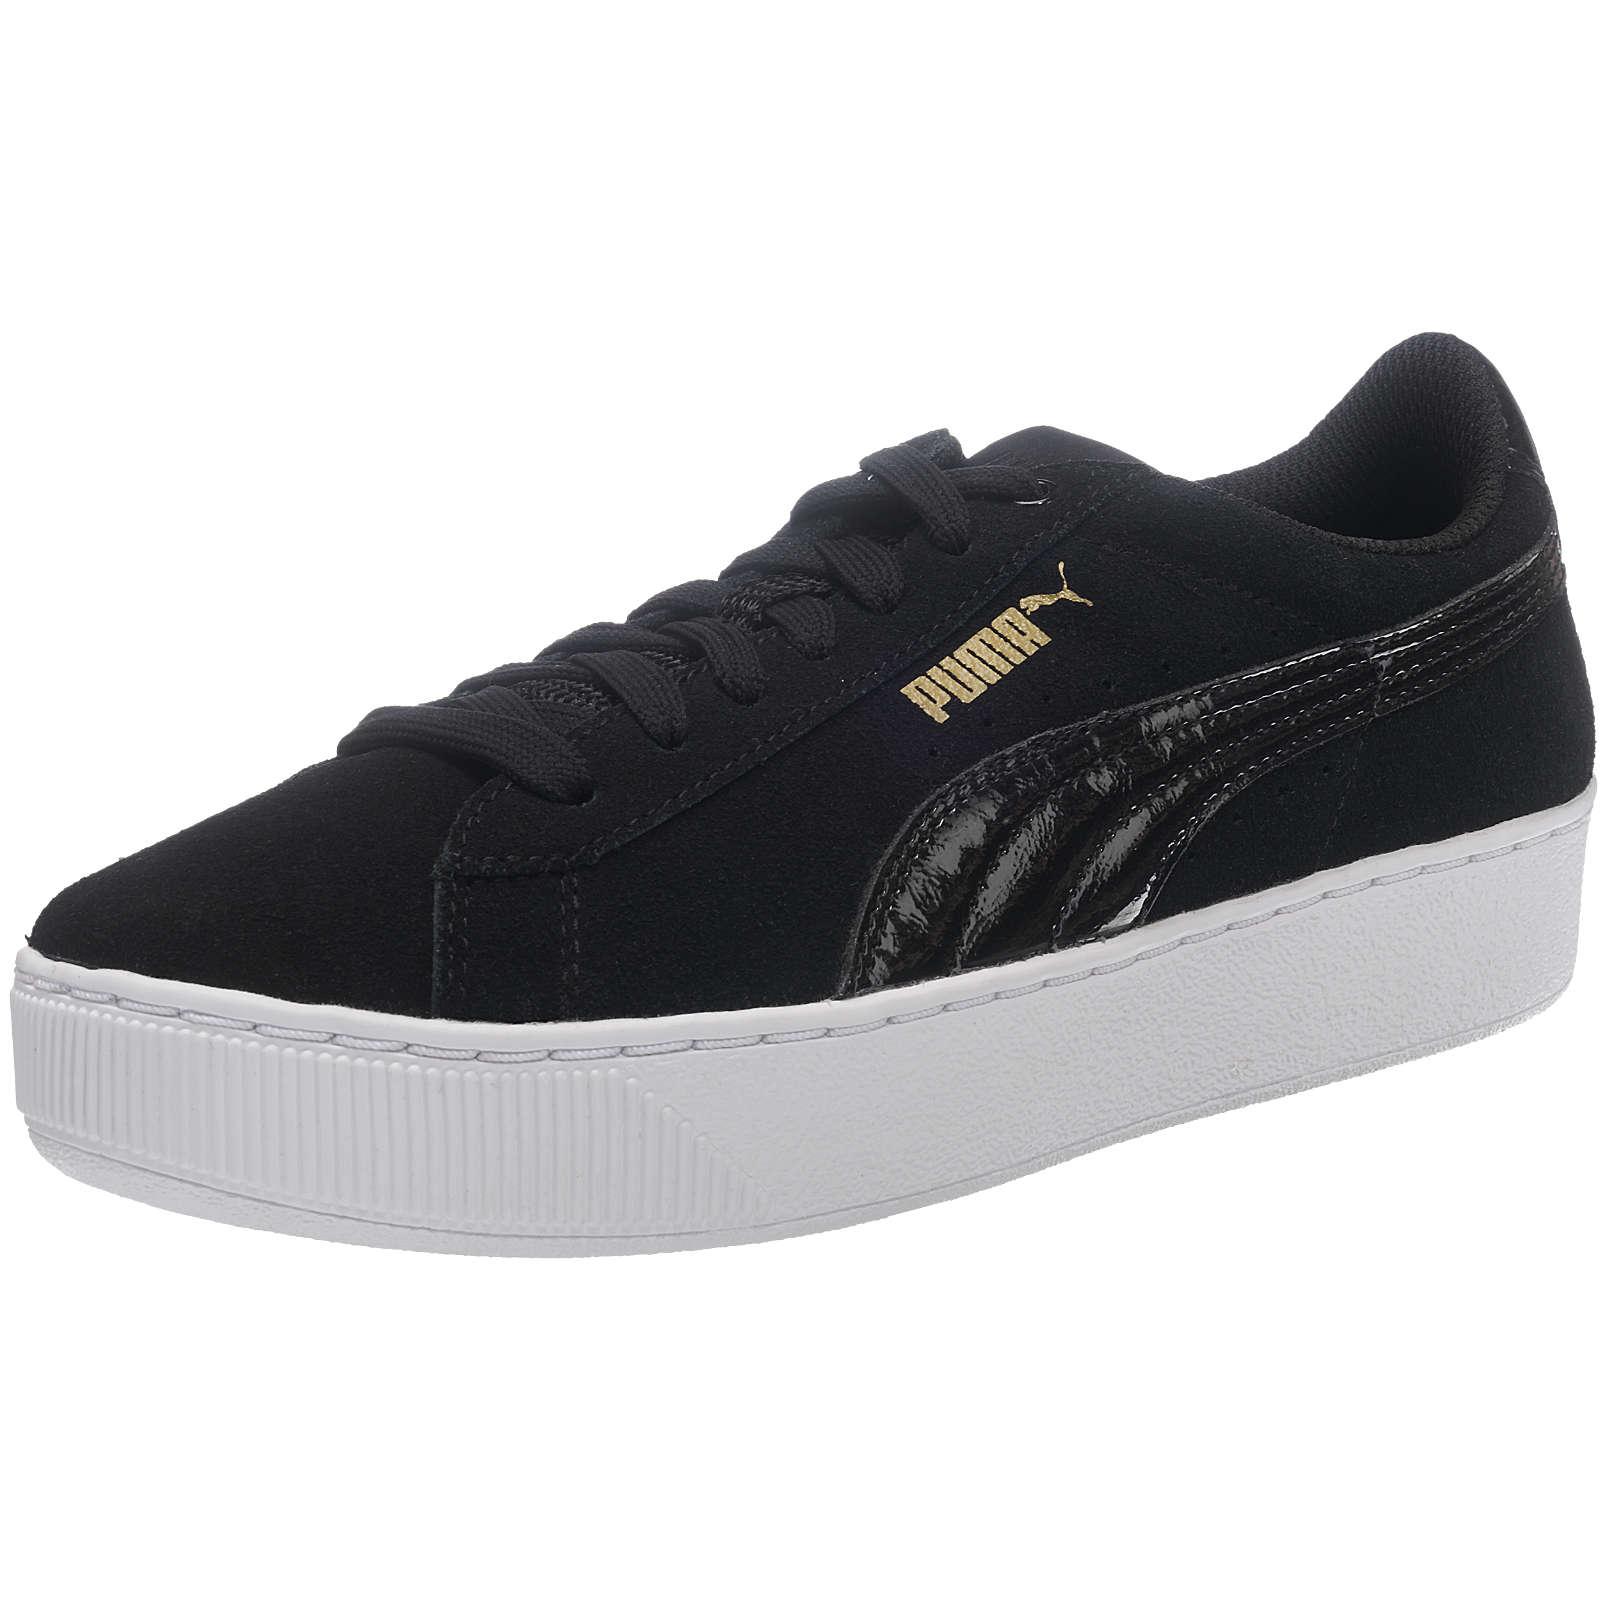 PUMA Vikky Platform Sneakers Low schwarz/weiß Damen Gr. 40